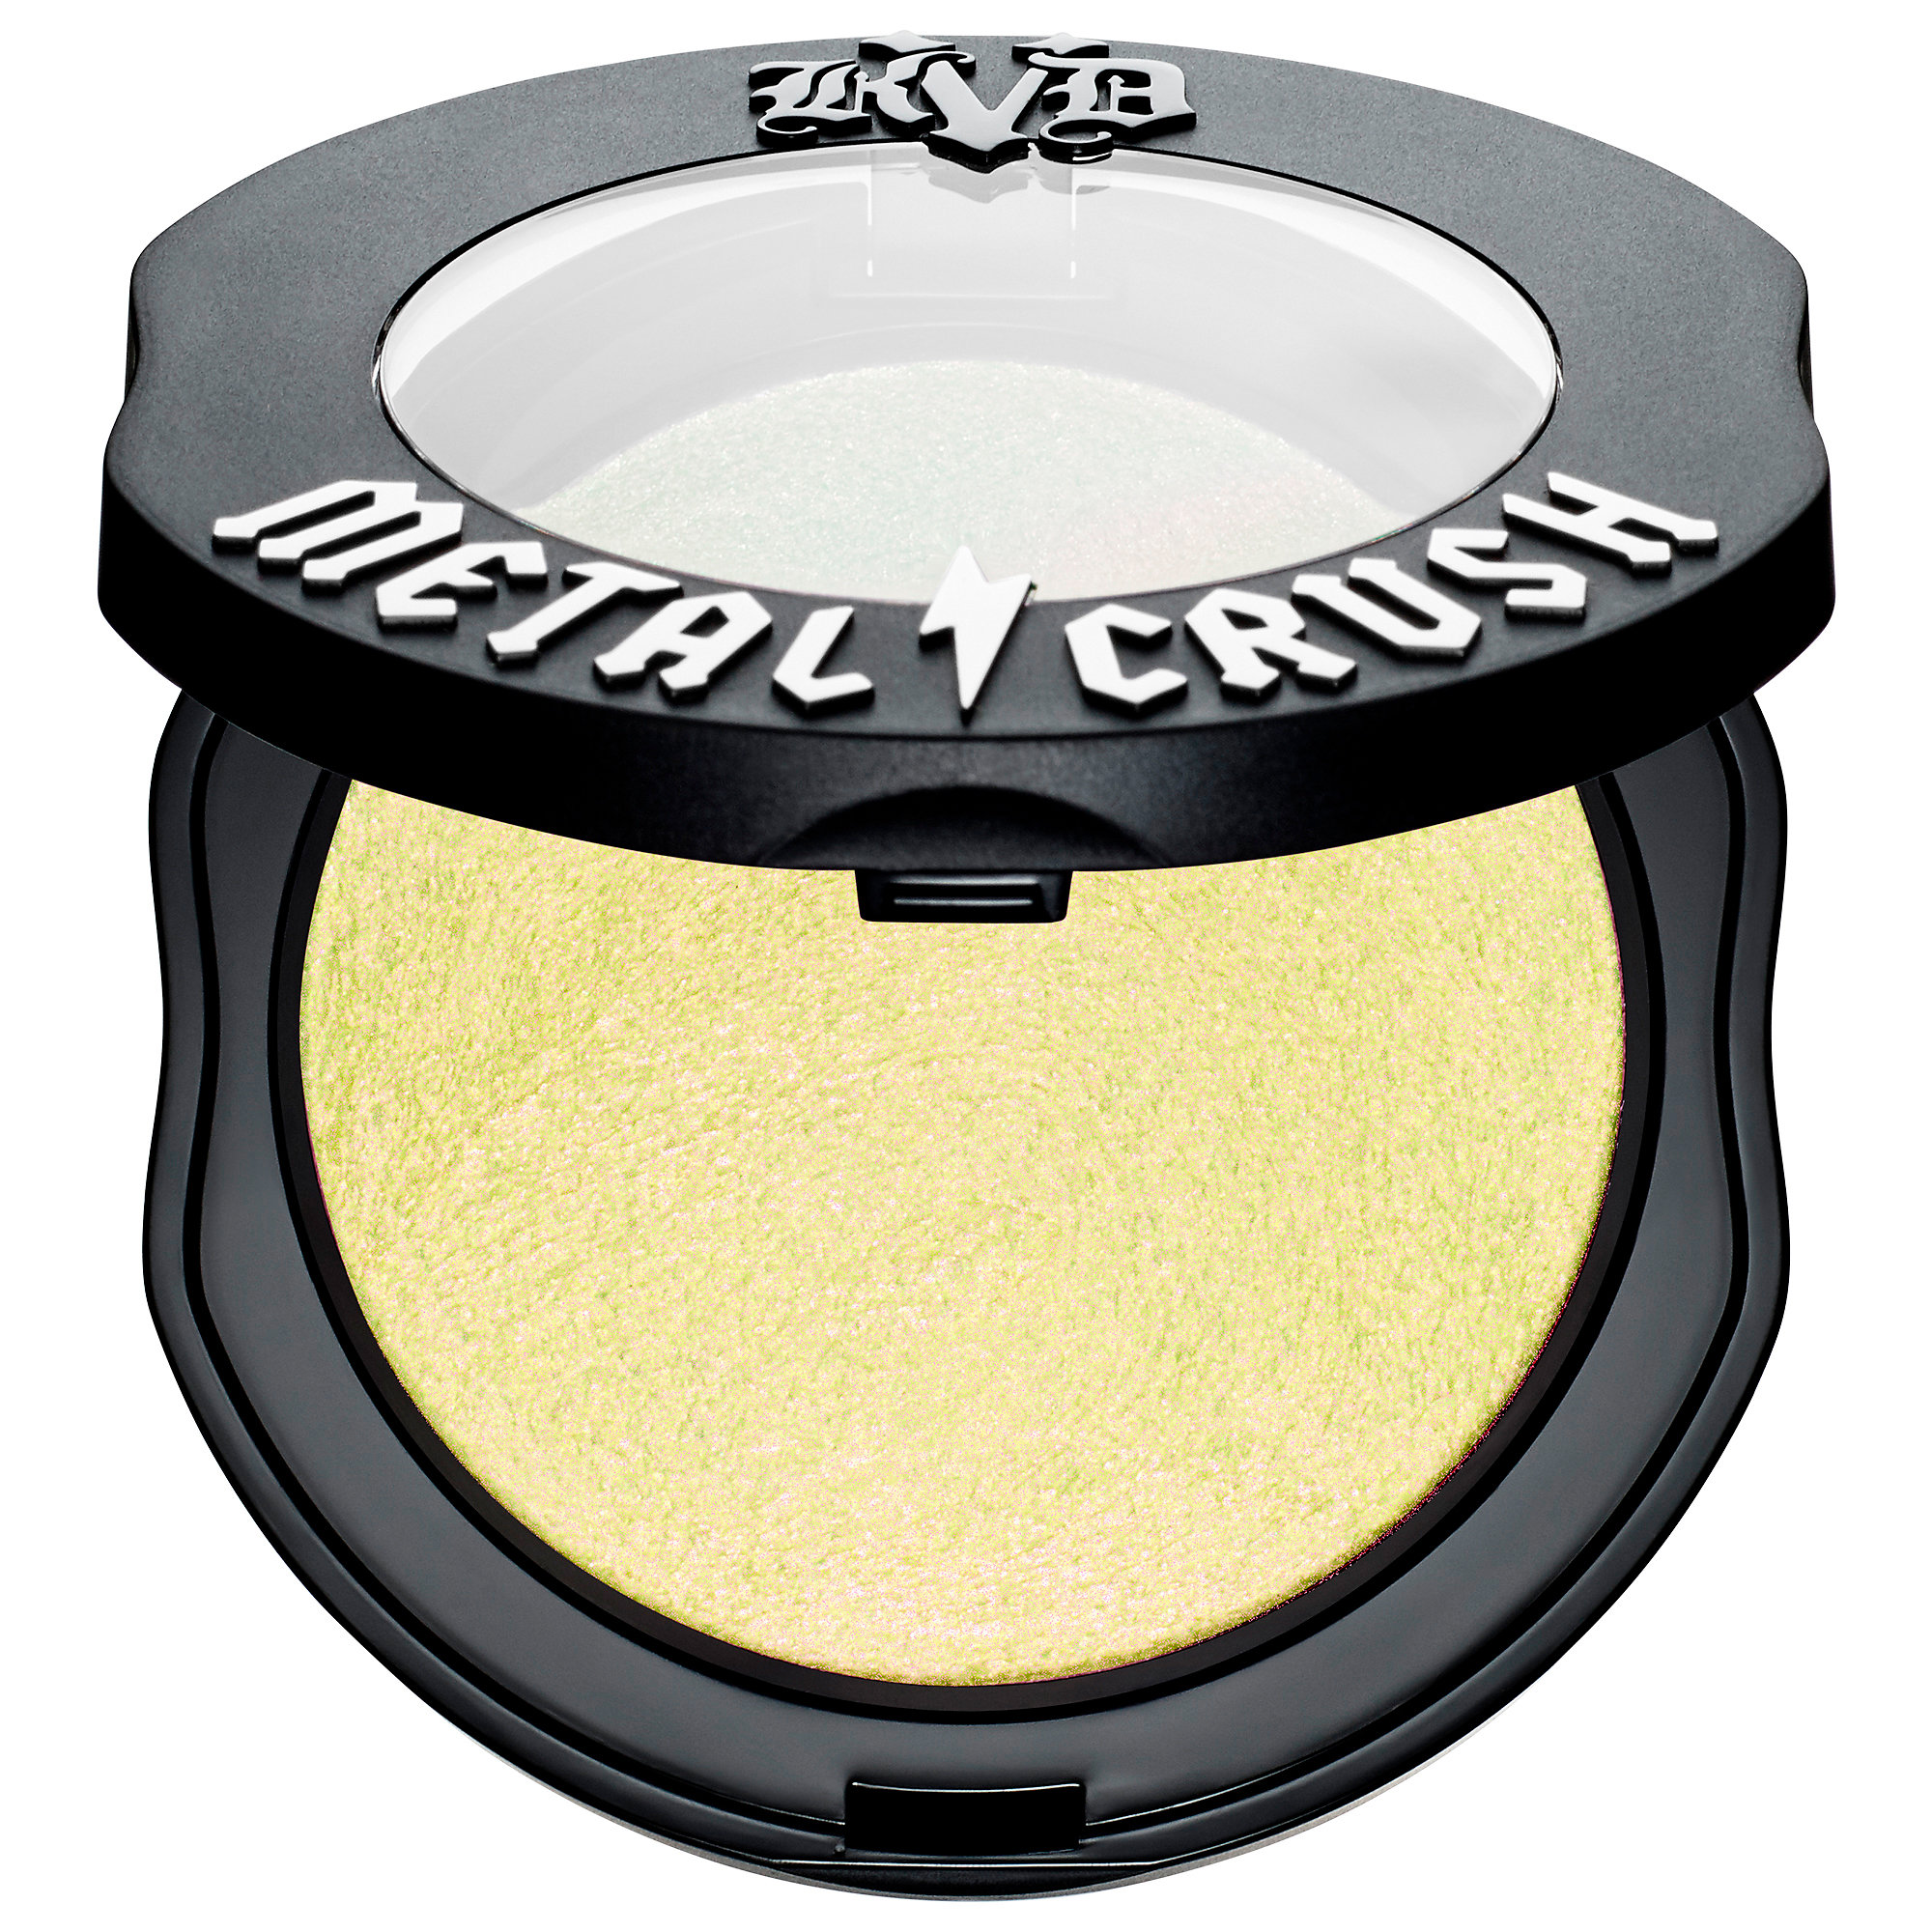 KVD Vegan Beauty - Metal Crush Extreme Highlighter